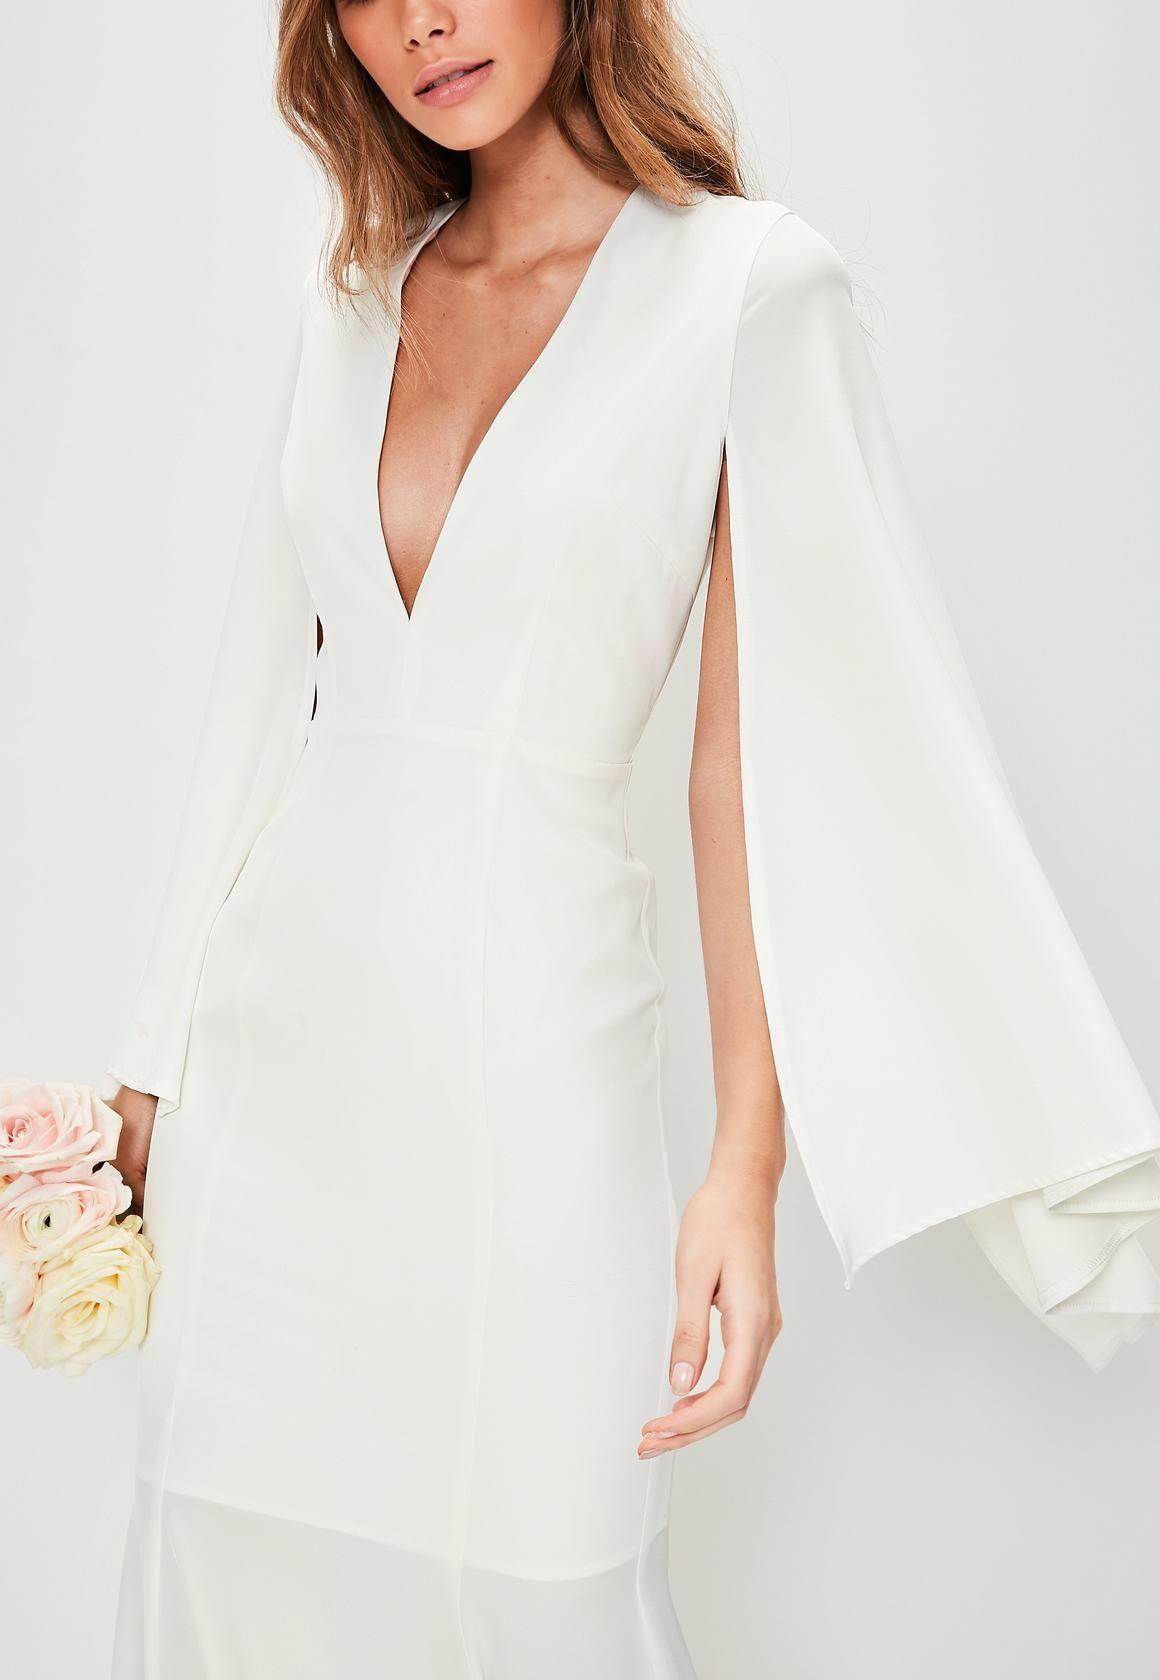 Missguided bridal white v plunge cape sleeve maxi dress 171 no missguided bridal white v plunge cape sleeve maxi dress 171 no free returns ombrellifo Gallery